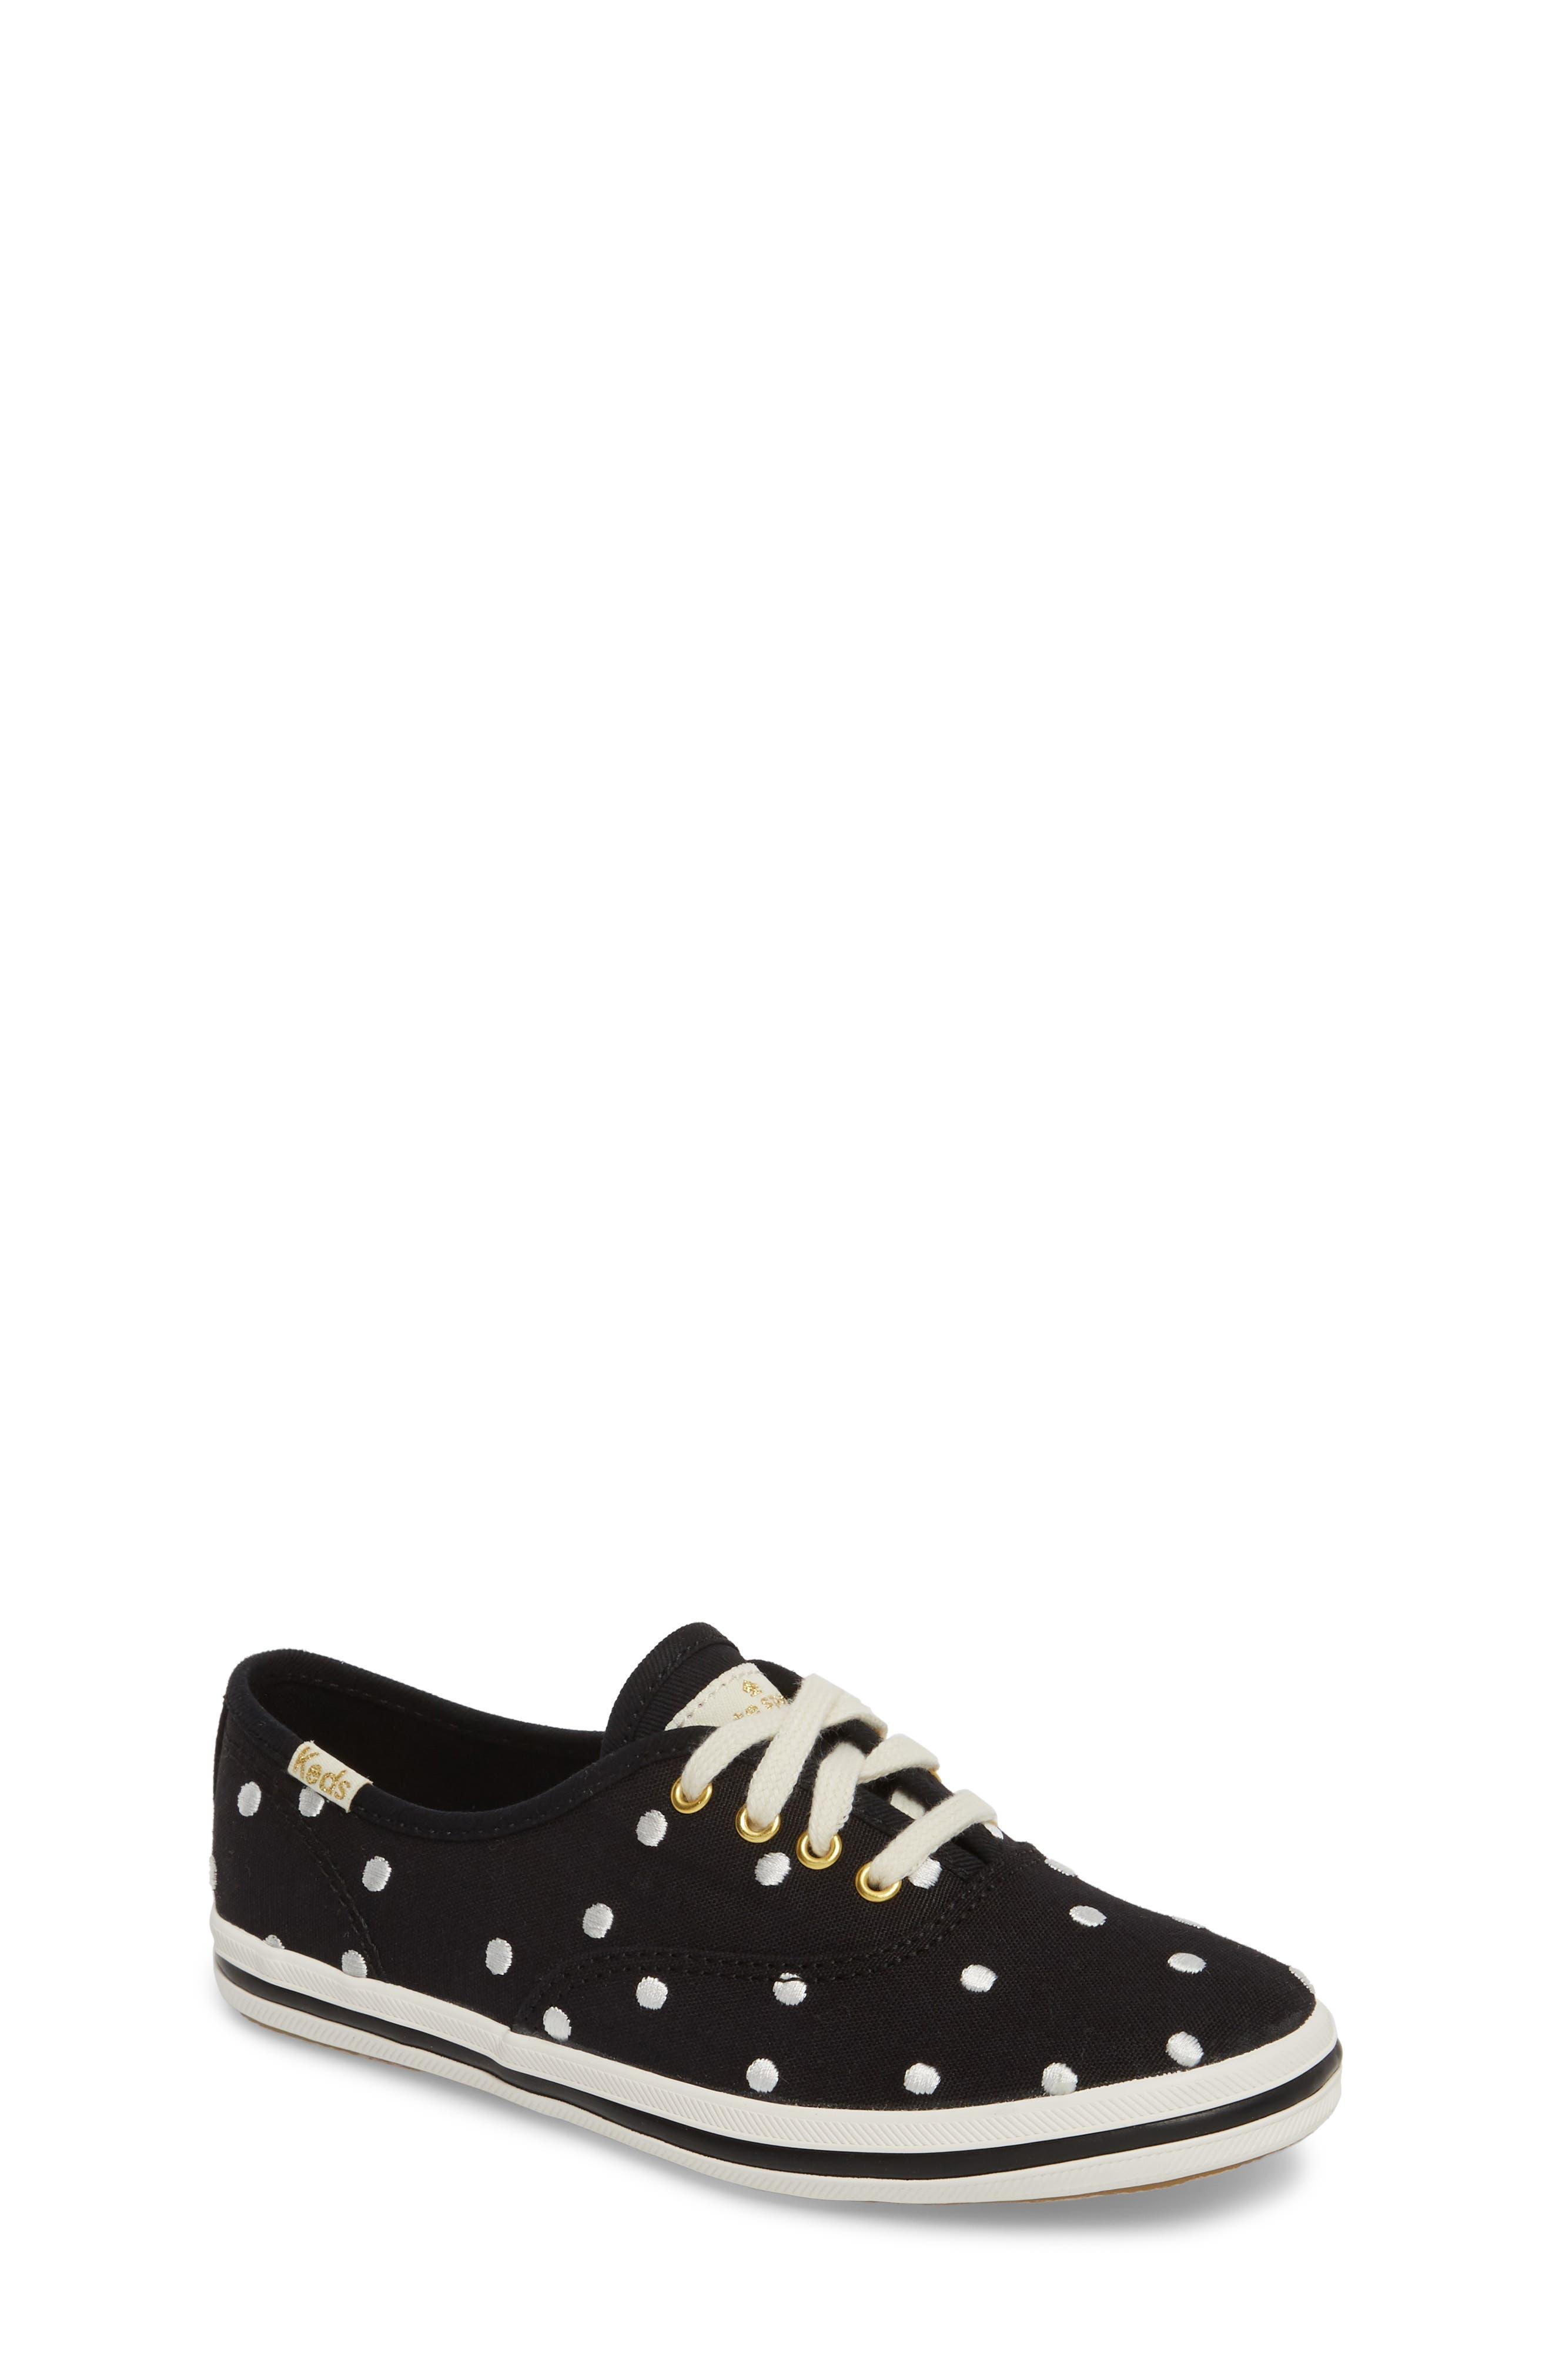 x kate spade new york champion polka dot lace-up shoe,                             Main thumbnail 1, color,                             BLACK DANCING DOT